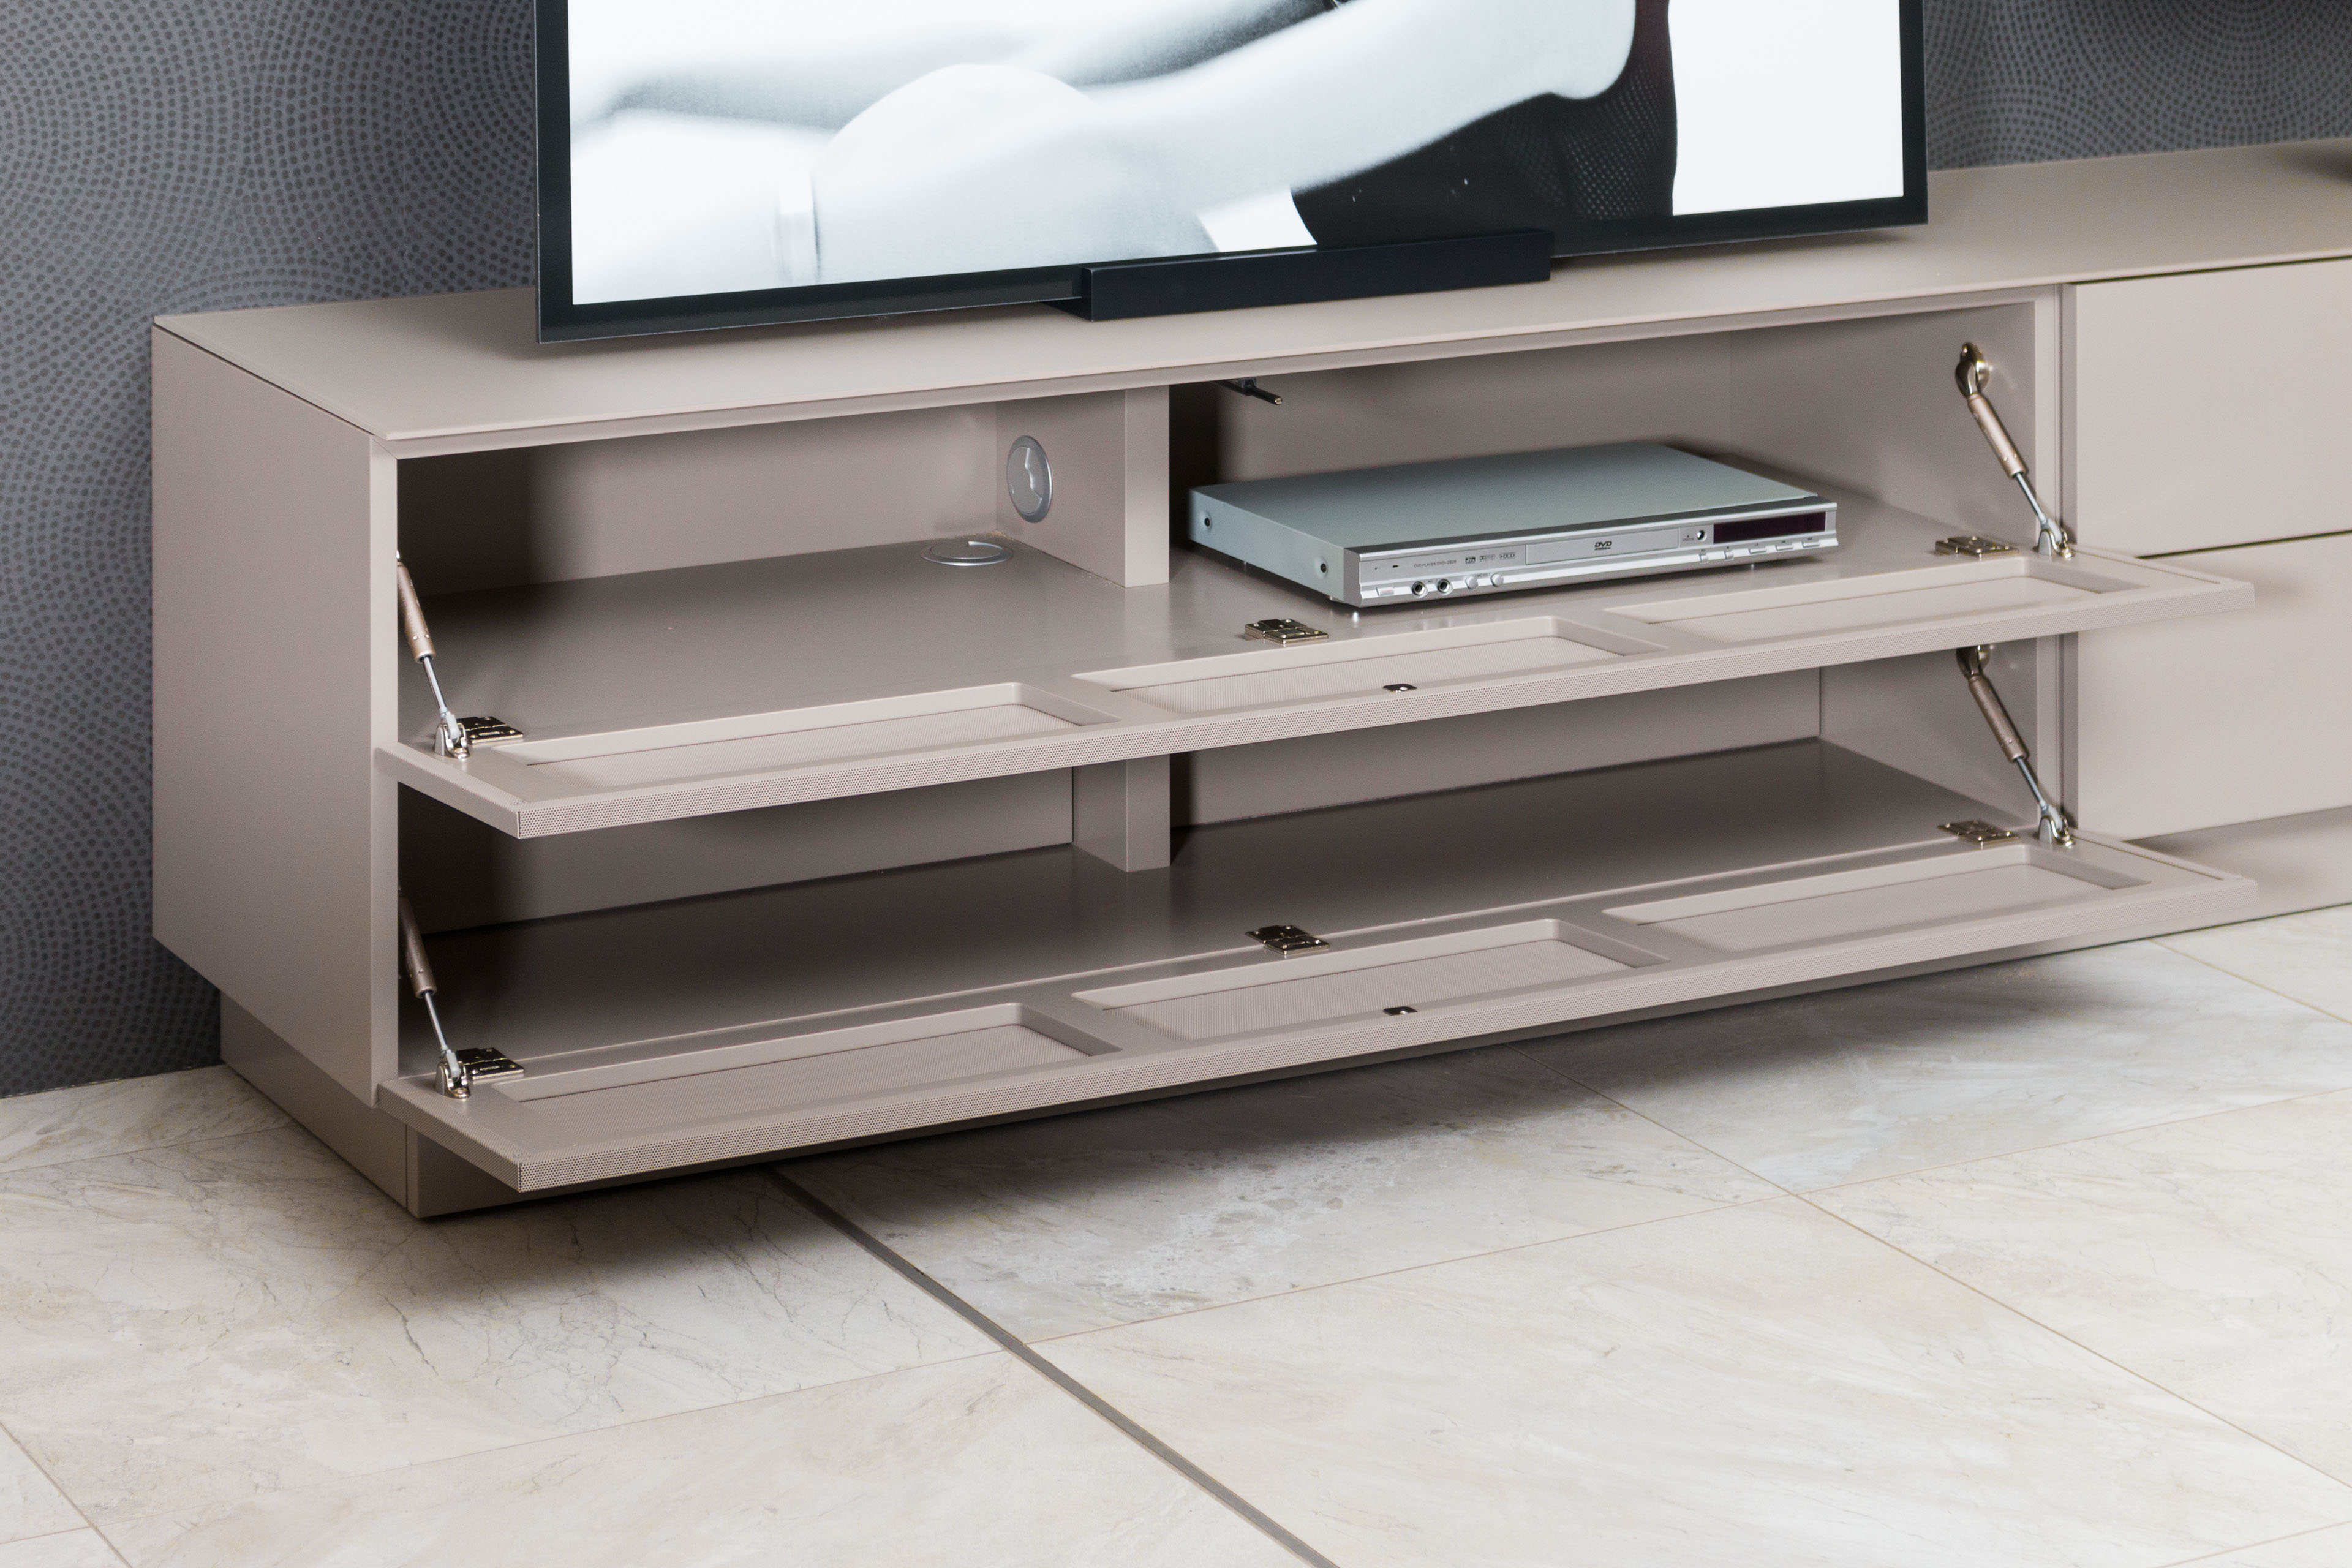 wohnwand cubo v61 von sudbrock m bel letz ihr online shop. Black Bedroom Furniture Sets. Home Design Ideas